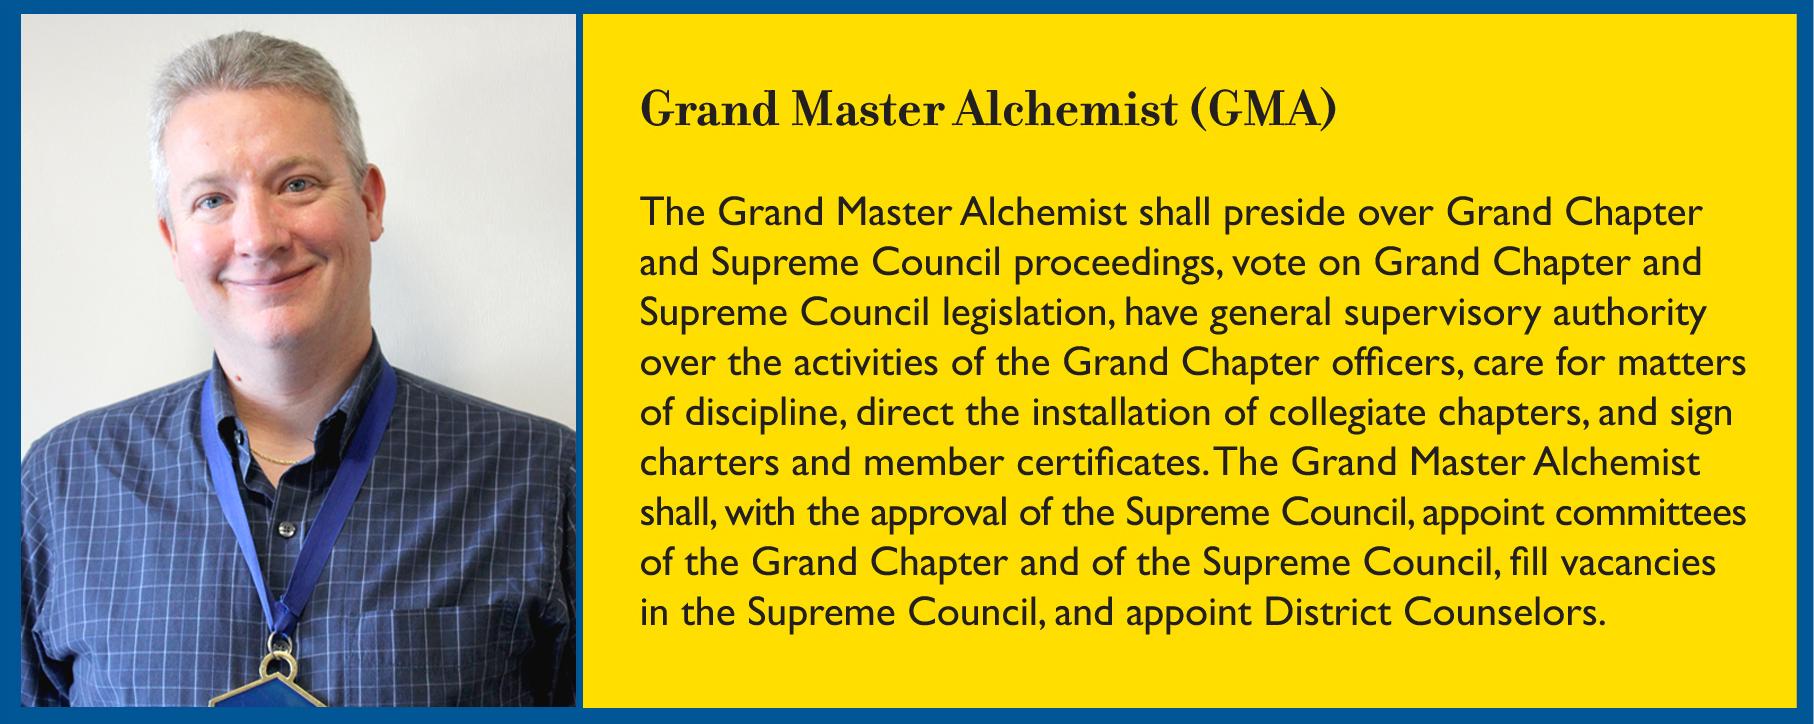 Grand Master Alchemist